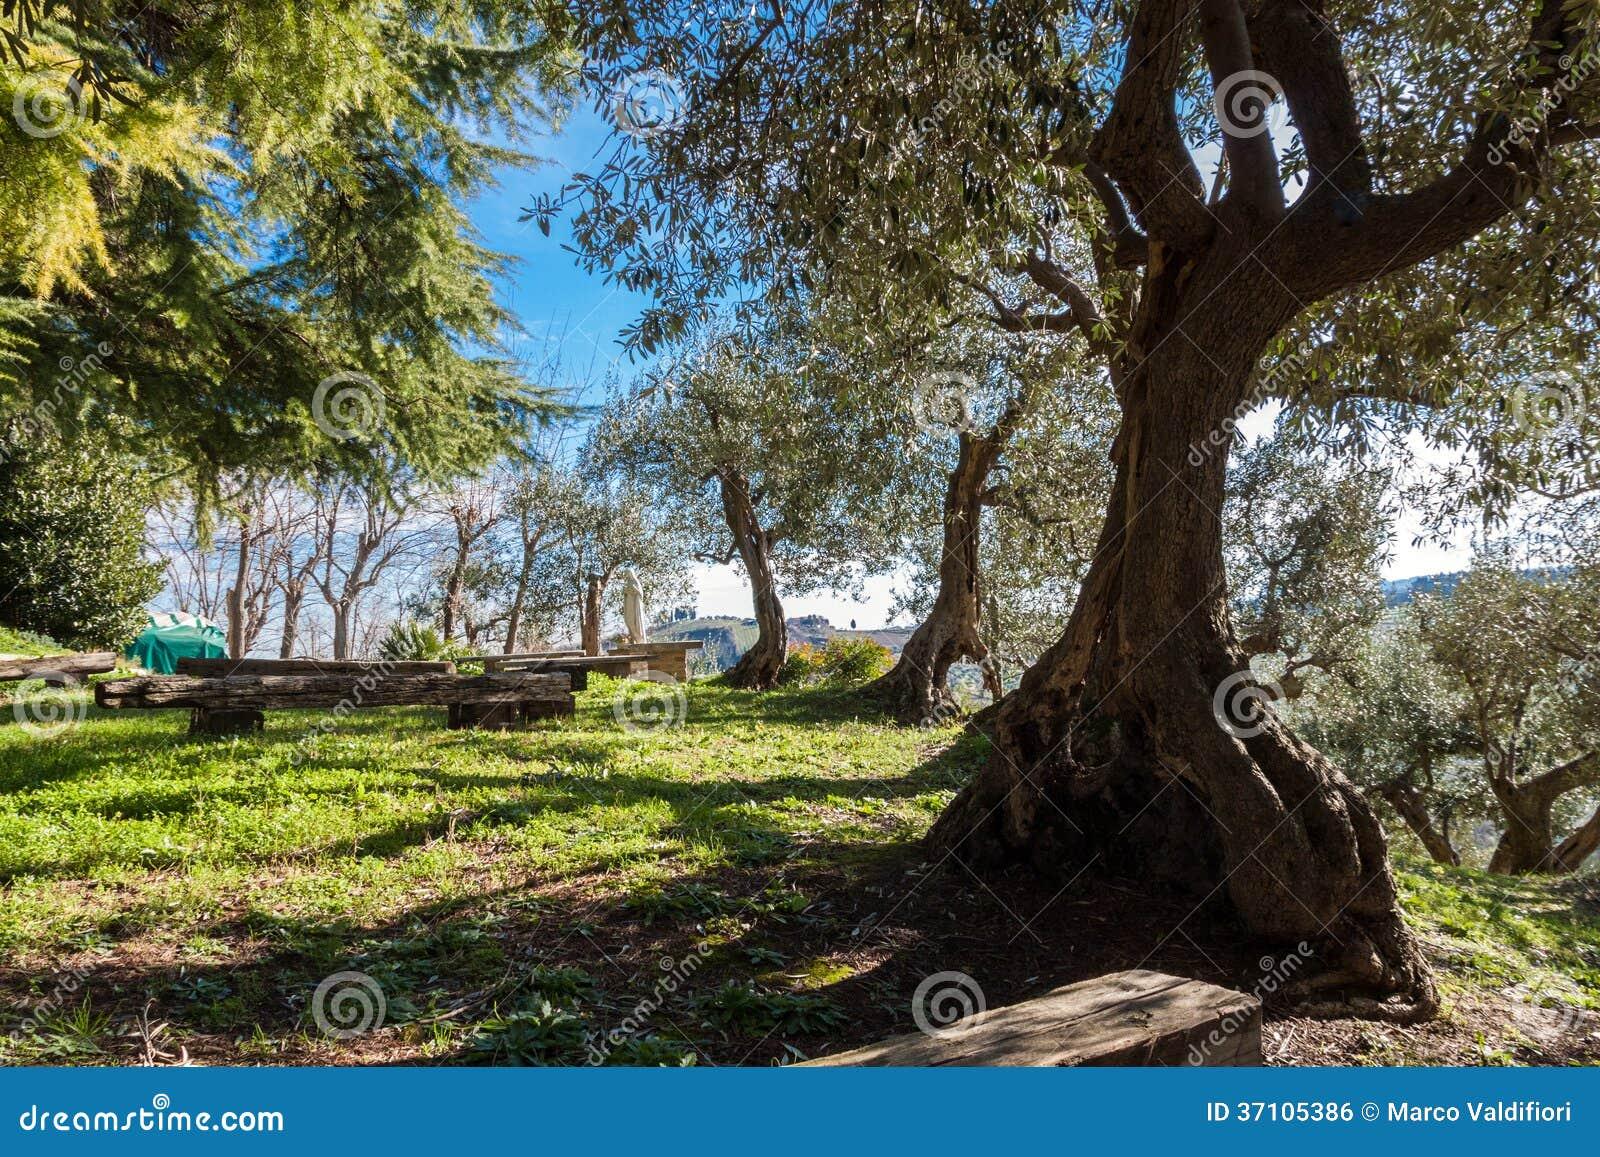 Oliveto antico